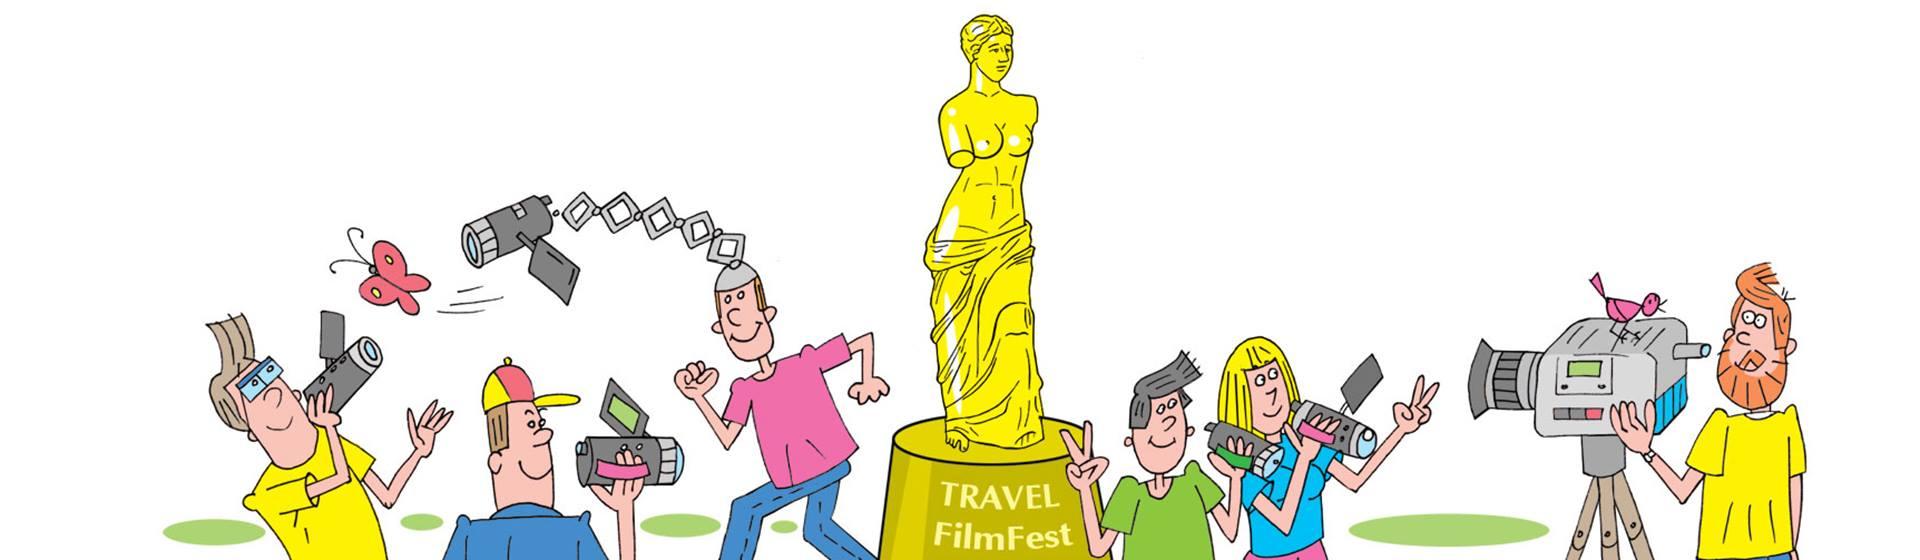 TRAVEL FilmFest 2019